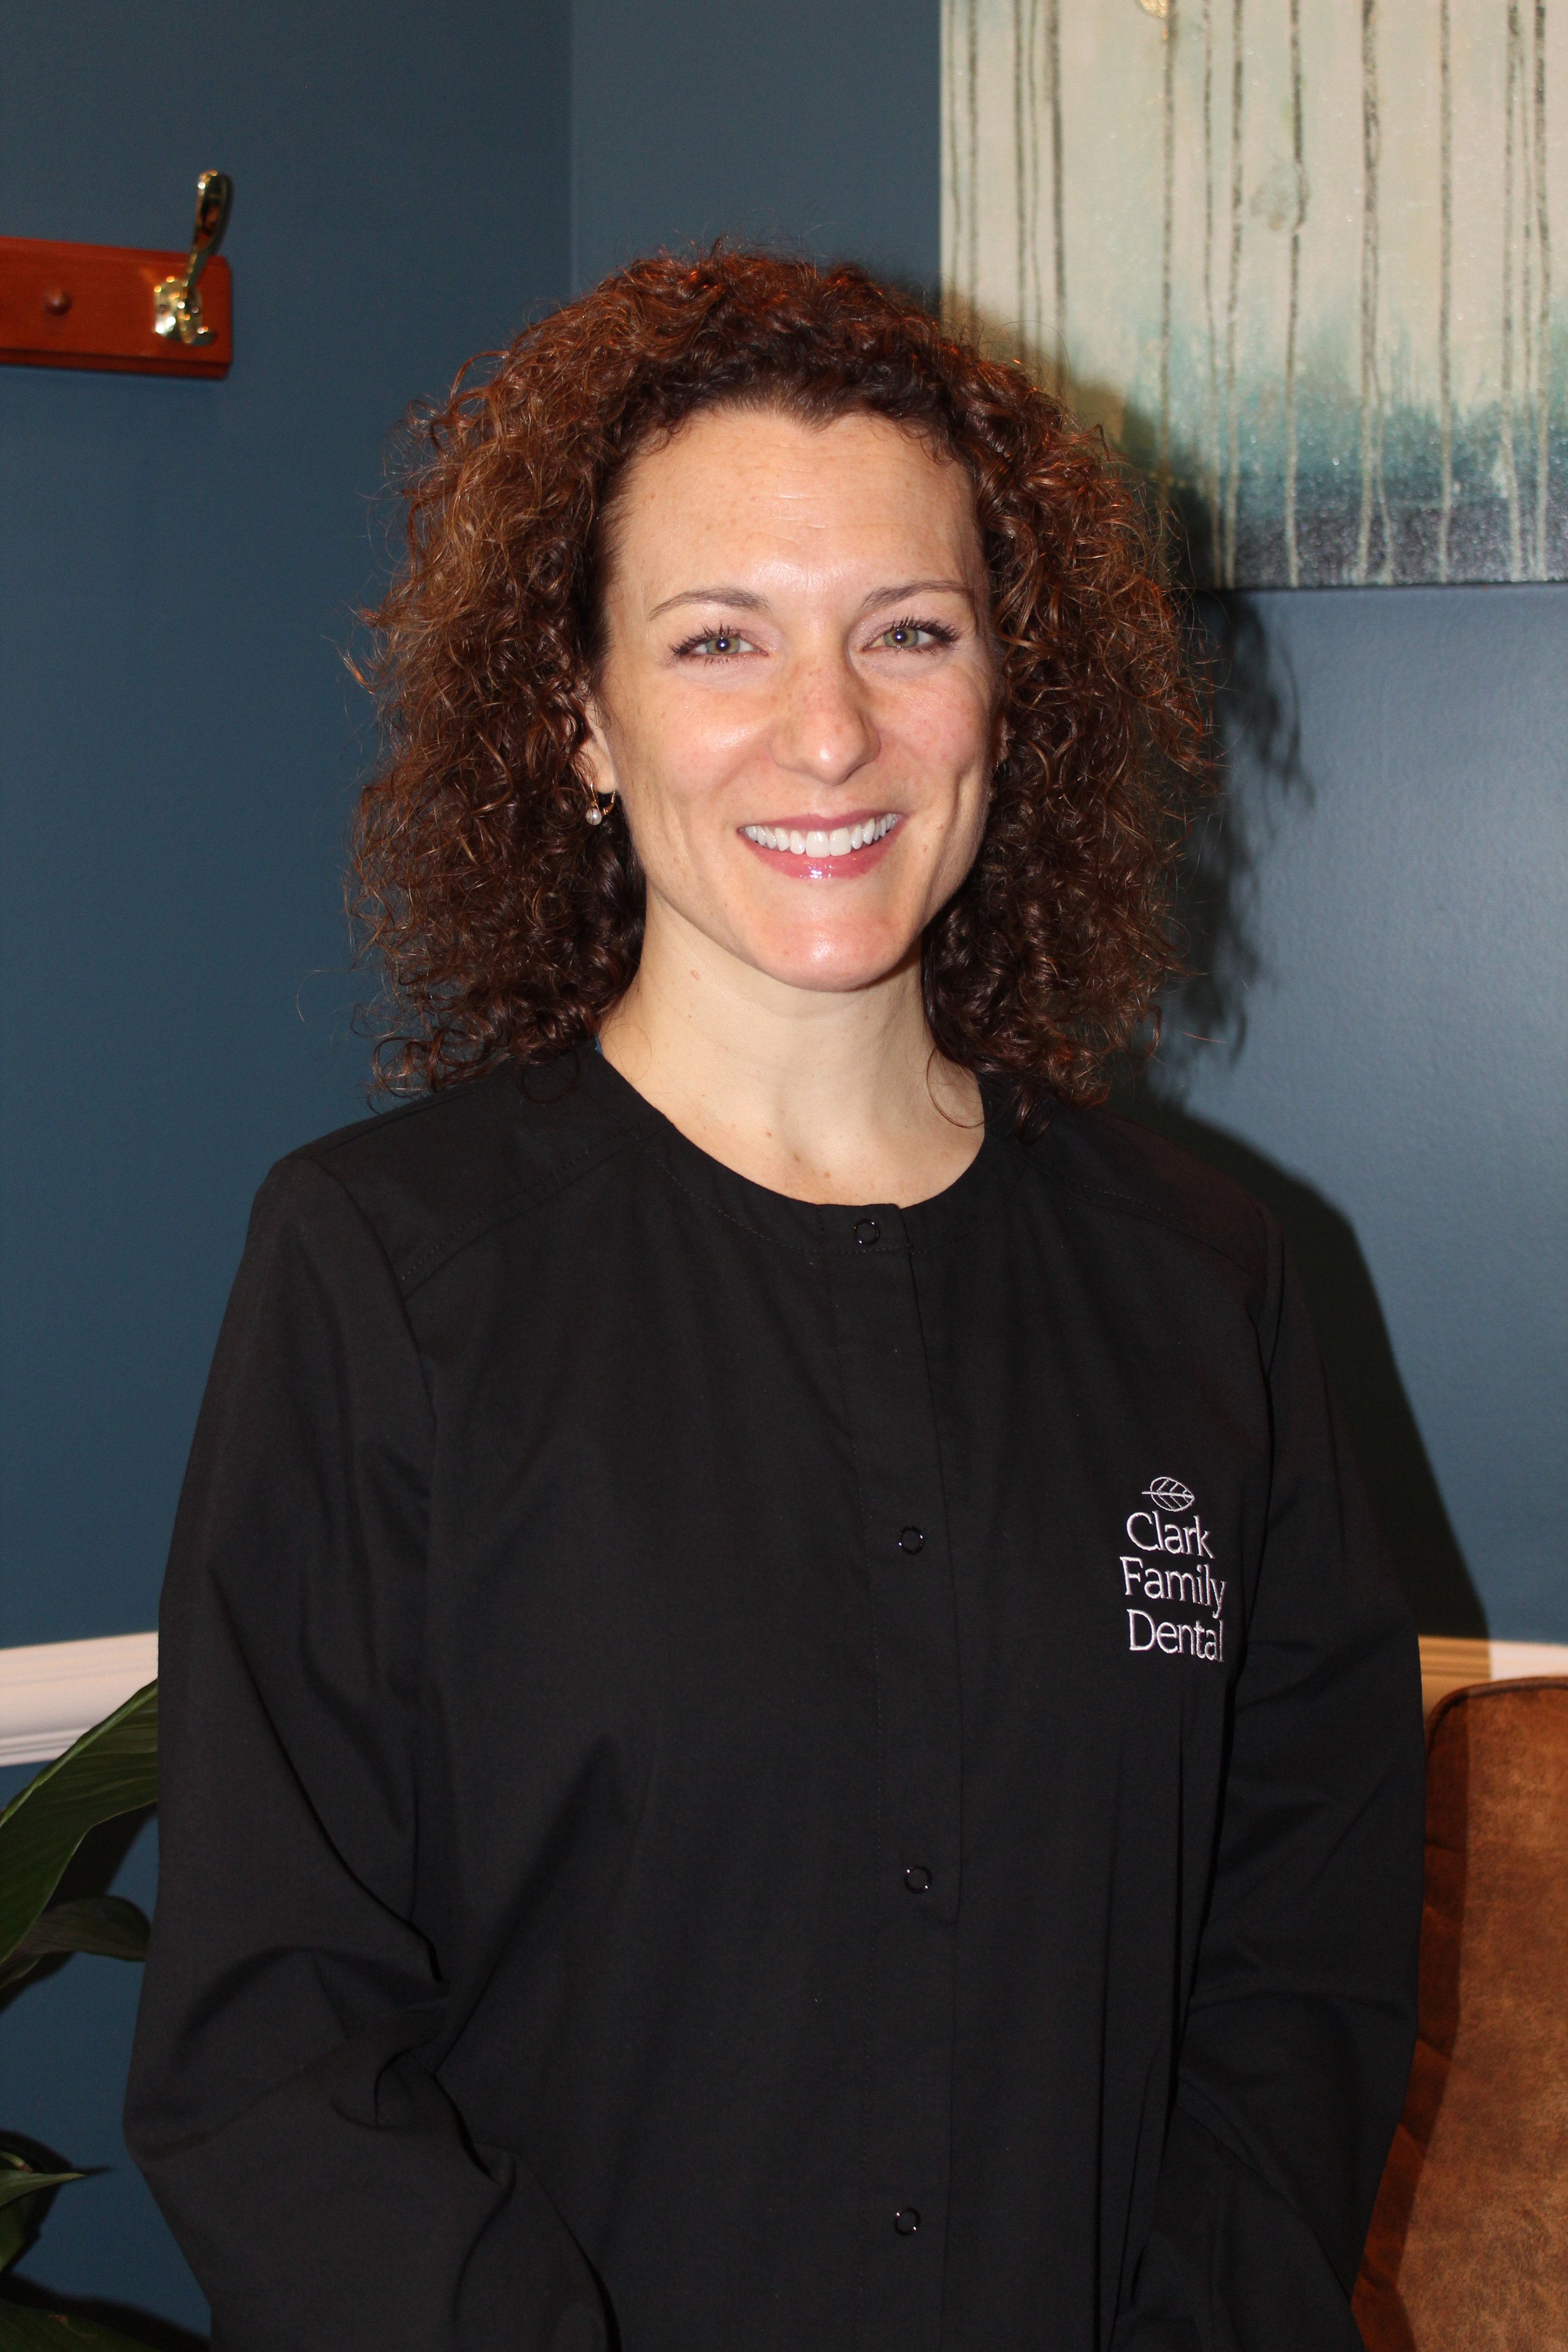 Dr. Allison Clark